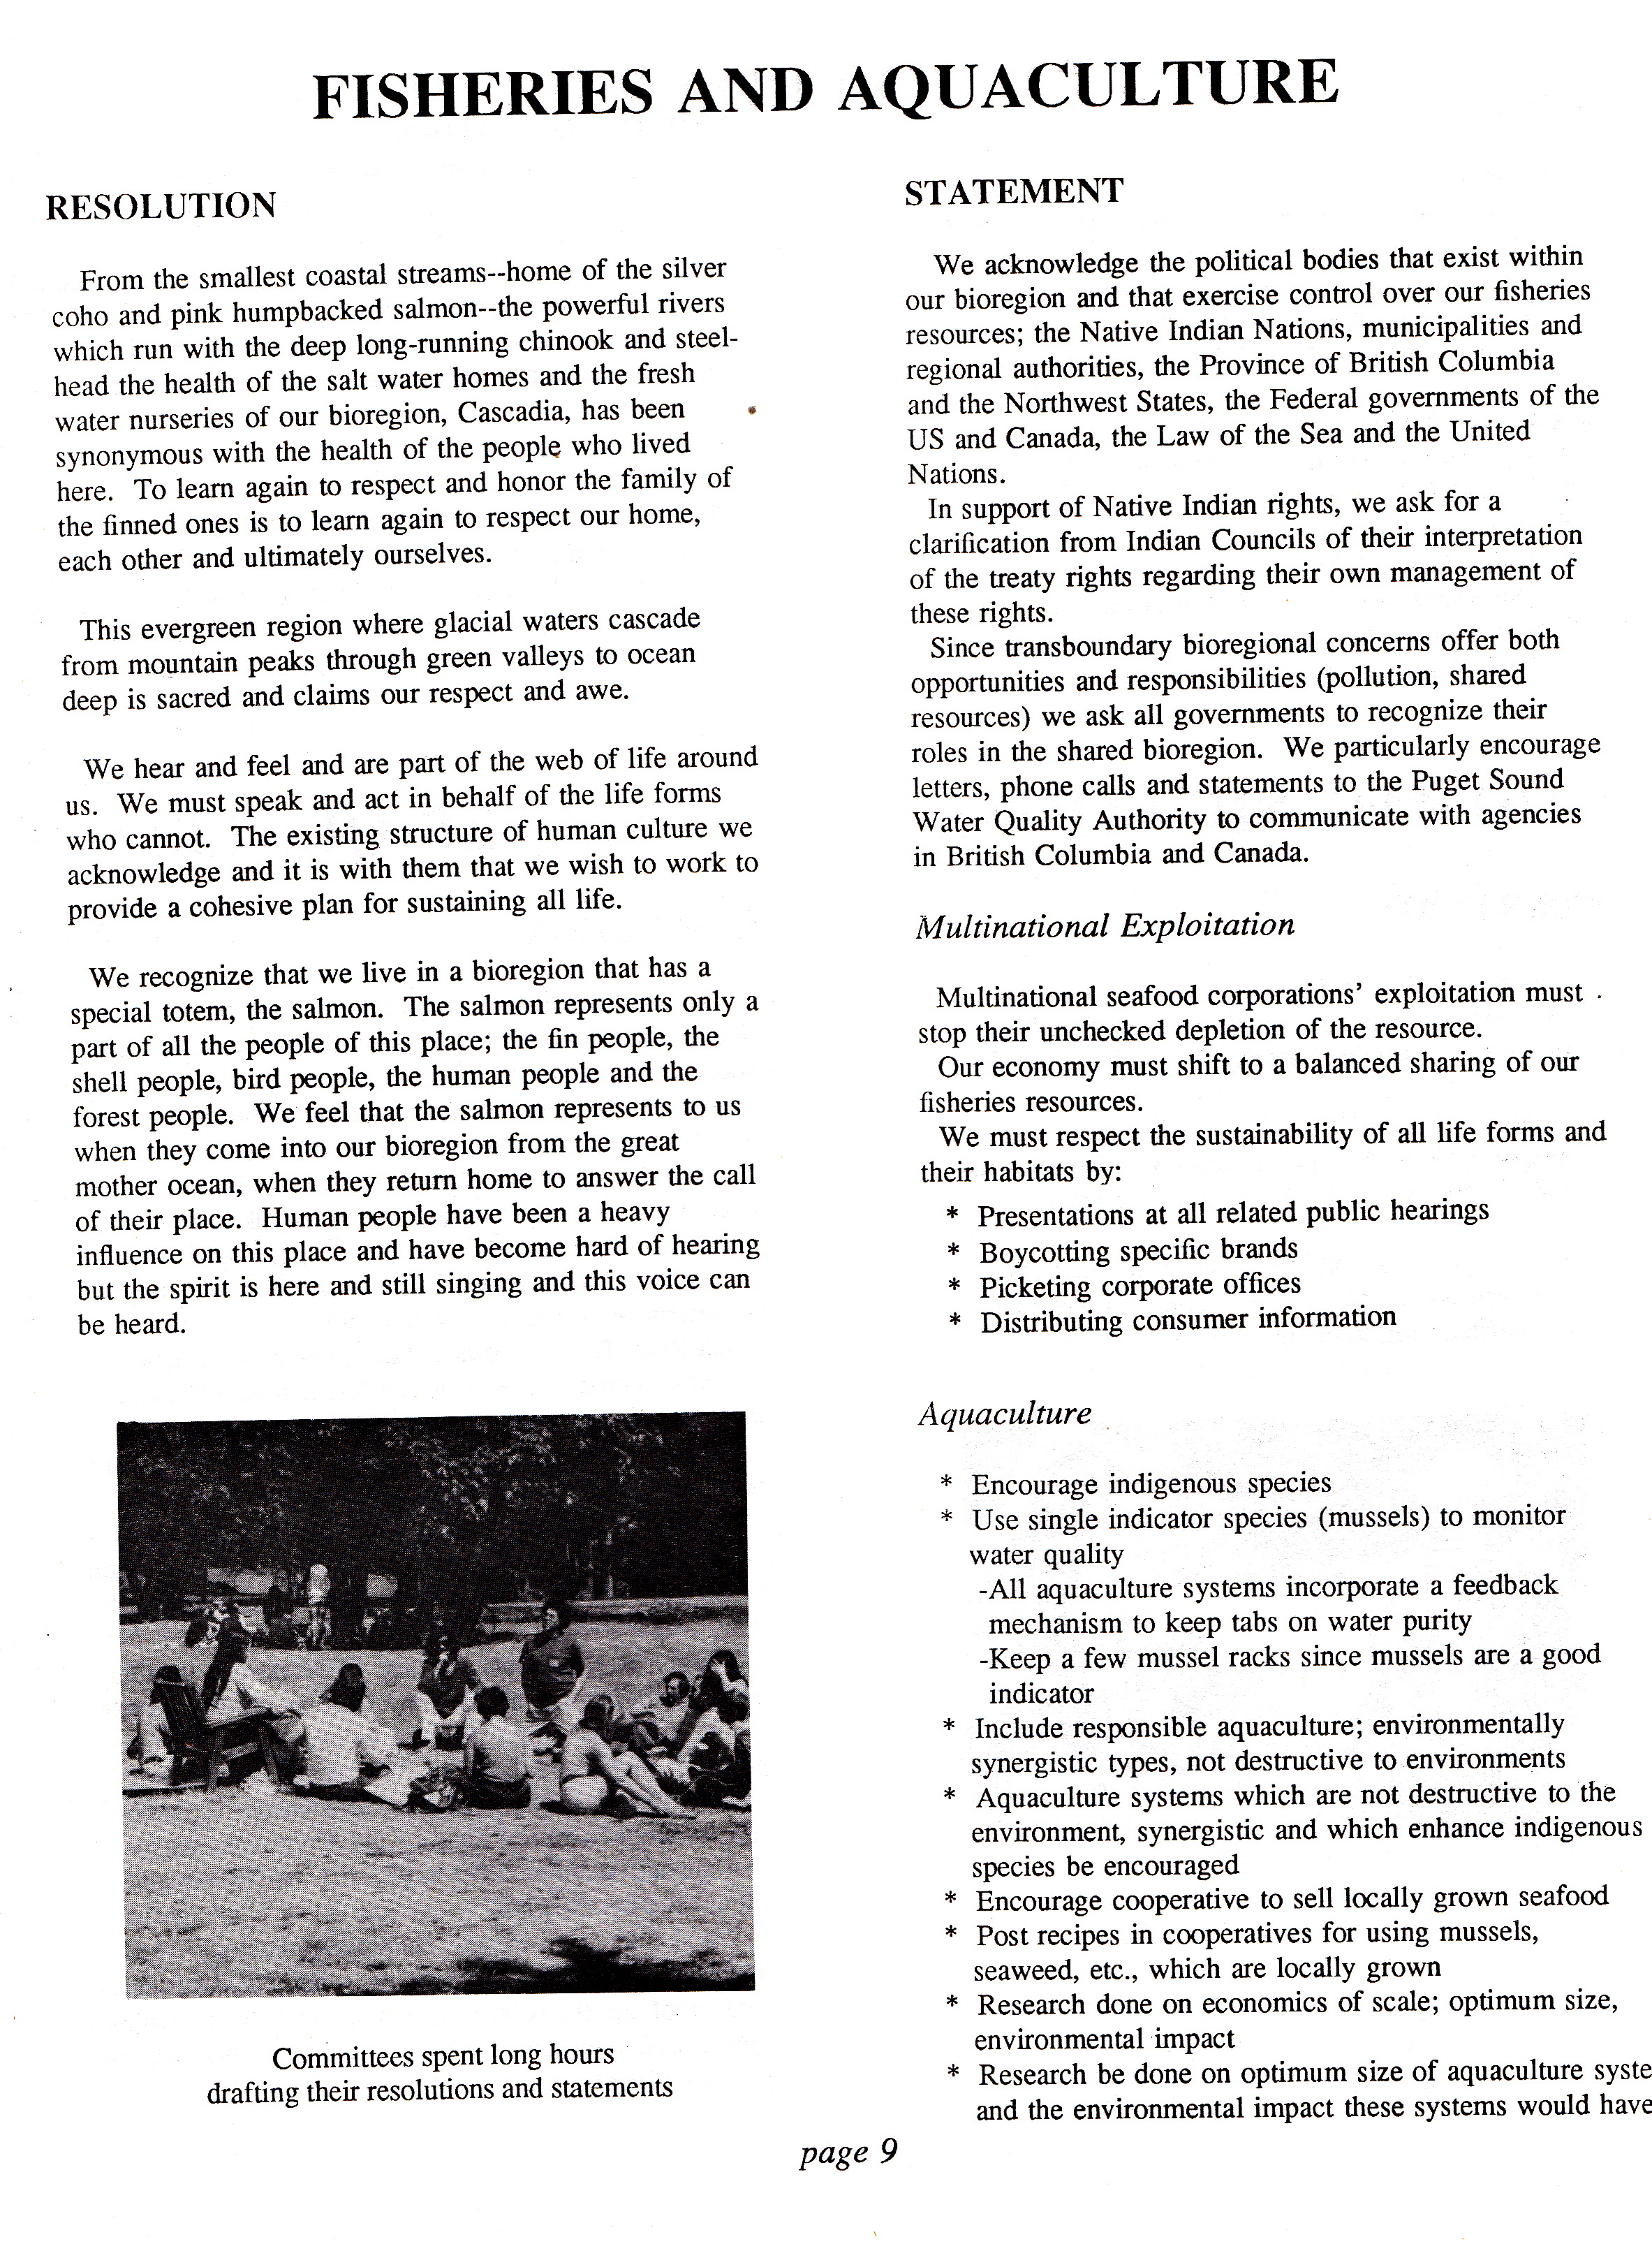 Cascadia Bioregional Congress 1986 Proceedings_0009.jpg